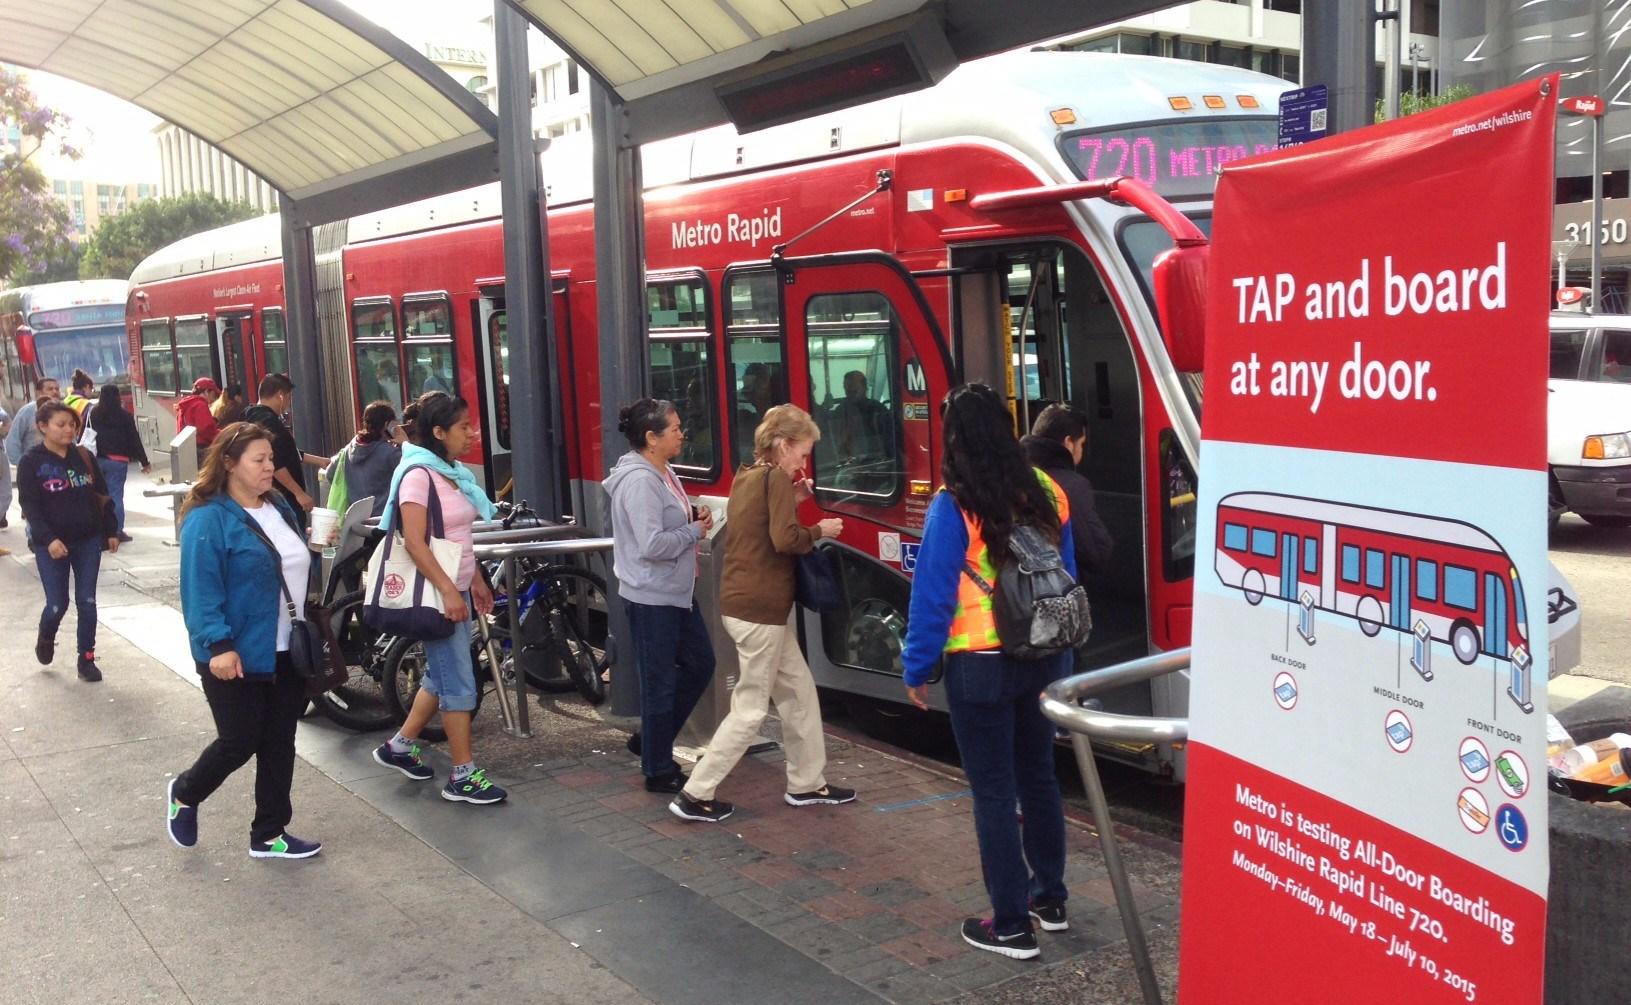 Los Angeles Metro Rapid BRT